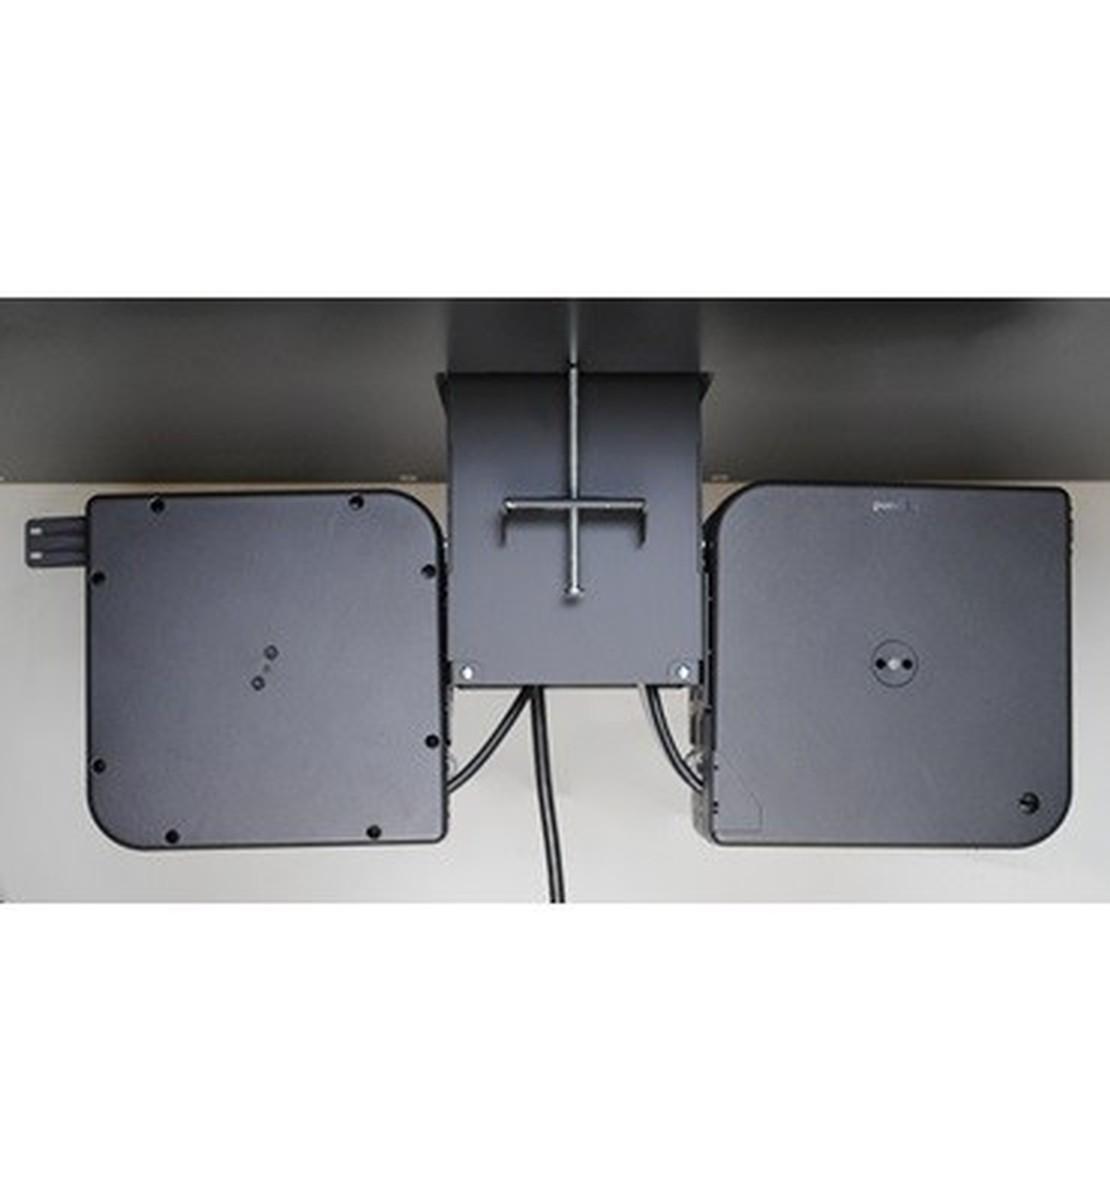 Wiremold Tbcrhdmi 5 Retractable Hdmi Cable For Tb672